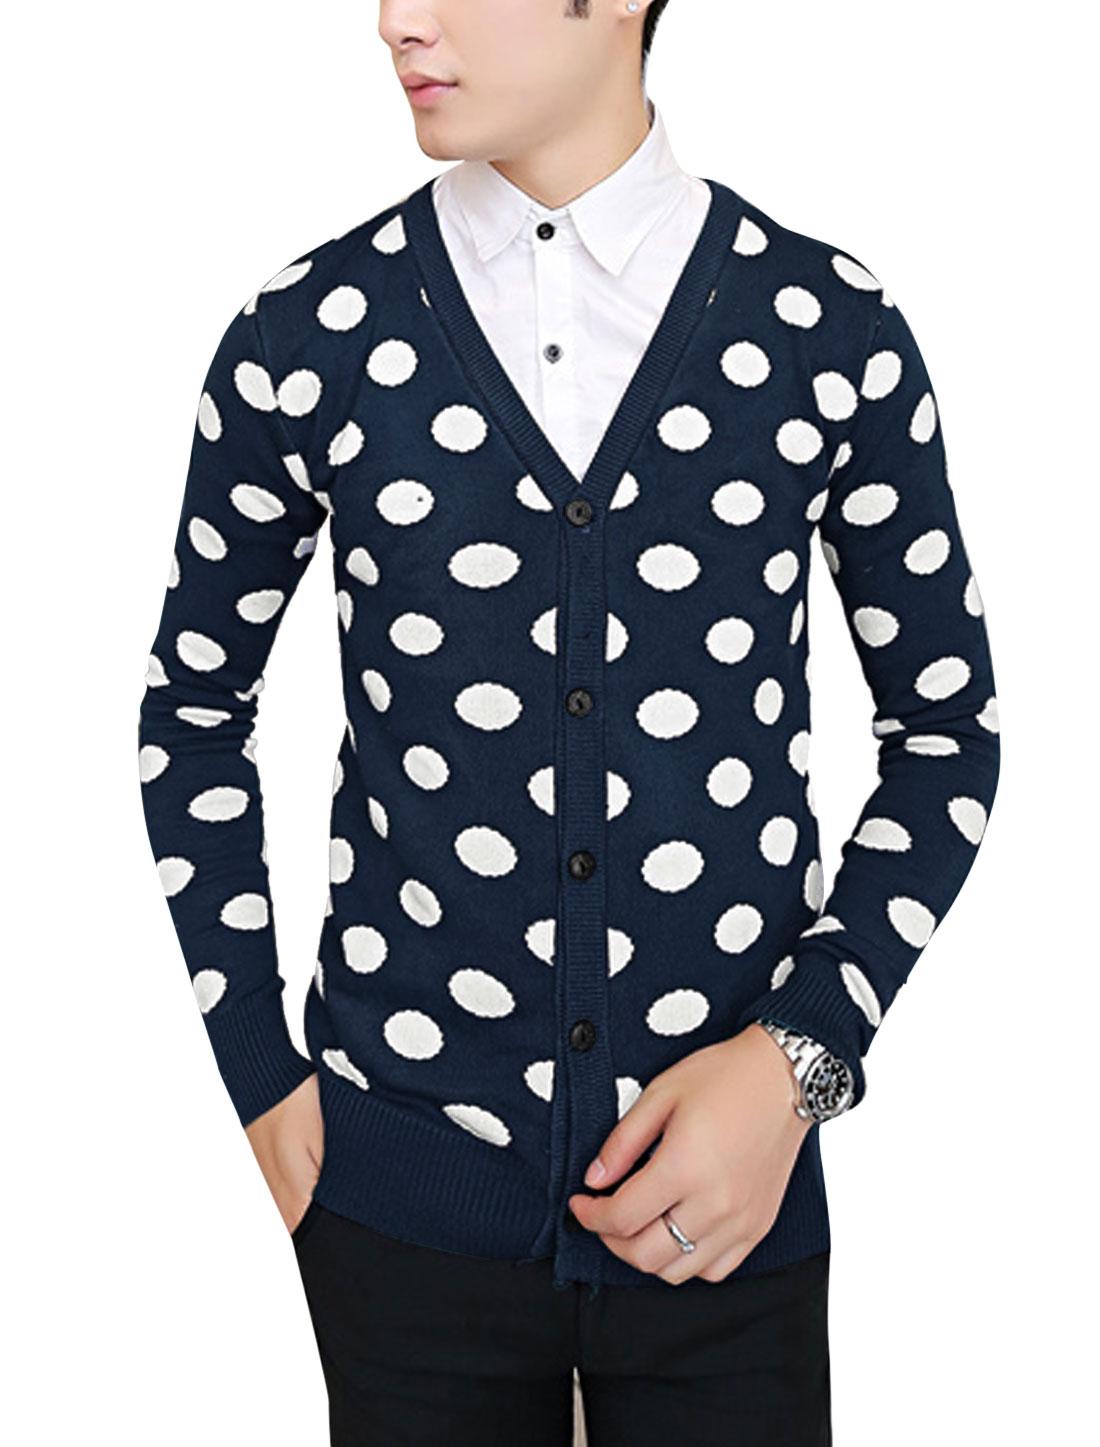 Men Single Breasted Dots Pattern Stylish Cozy Fit Cardigan Navy Blue S